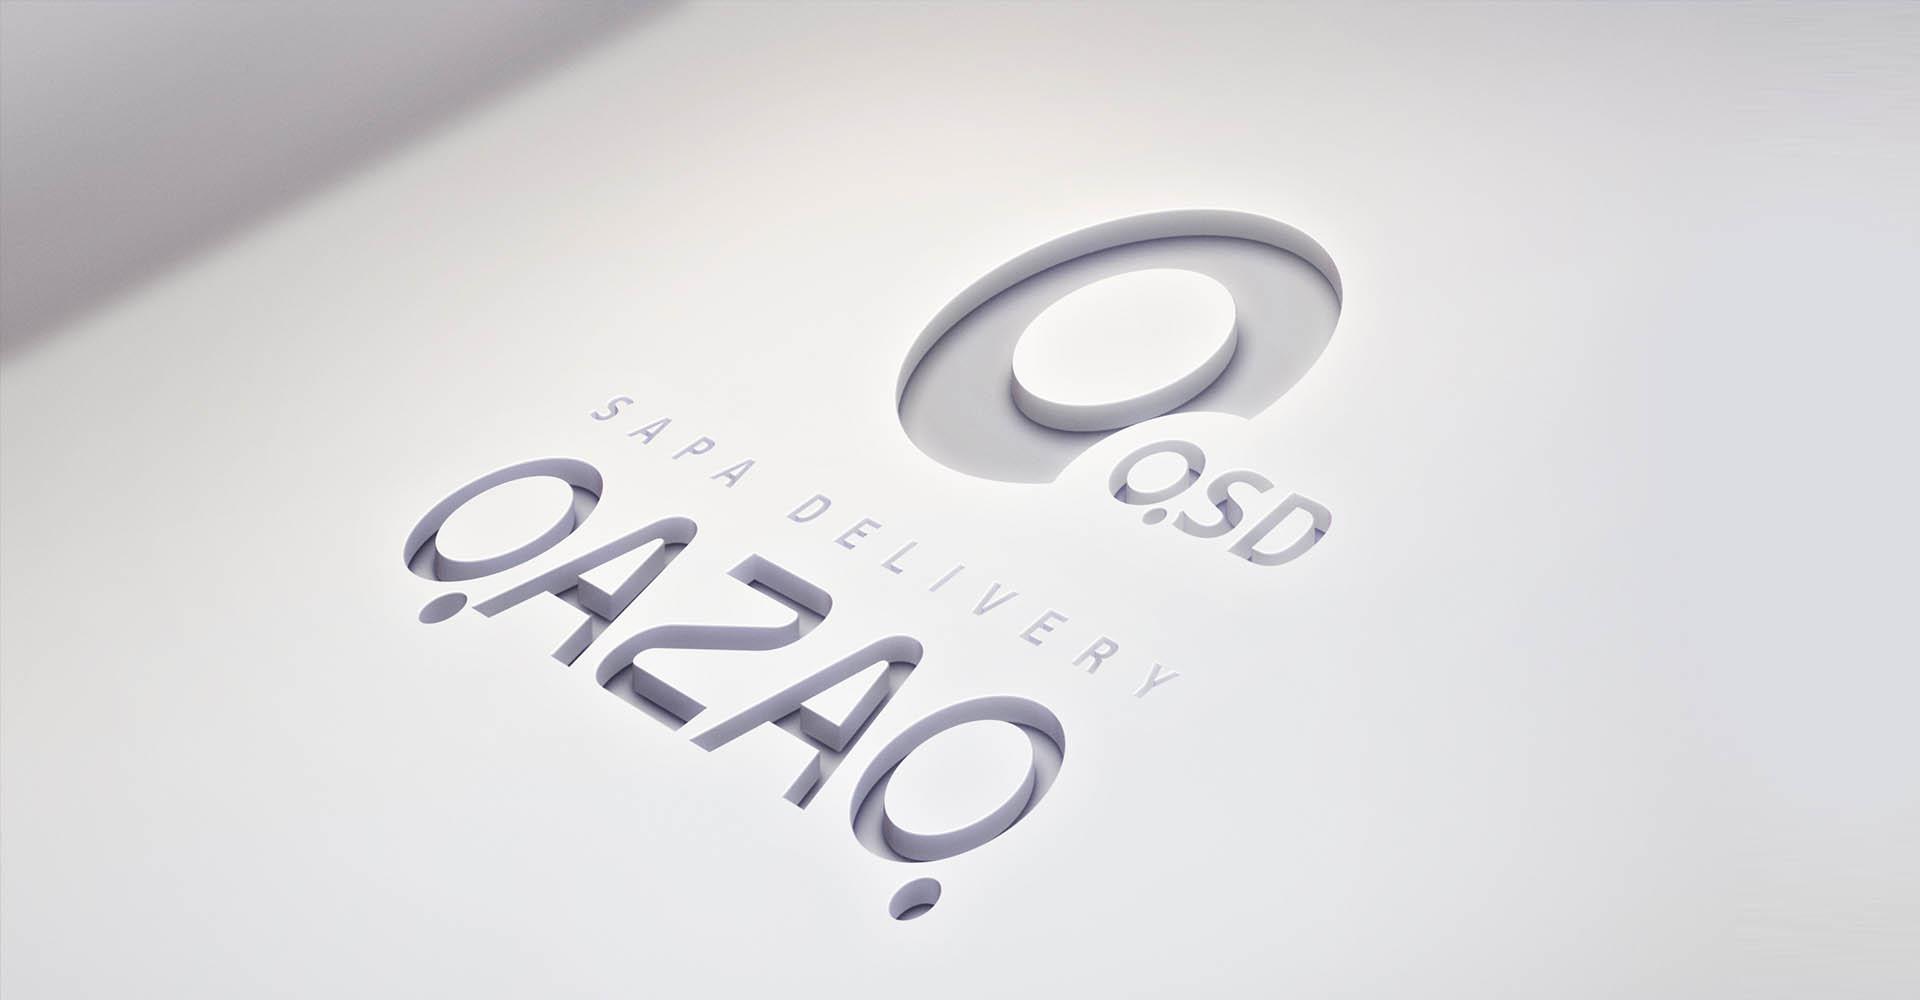 логотип транспортноый компании